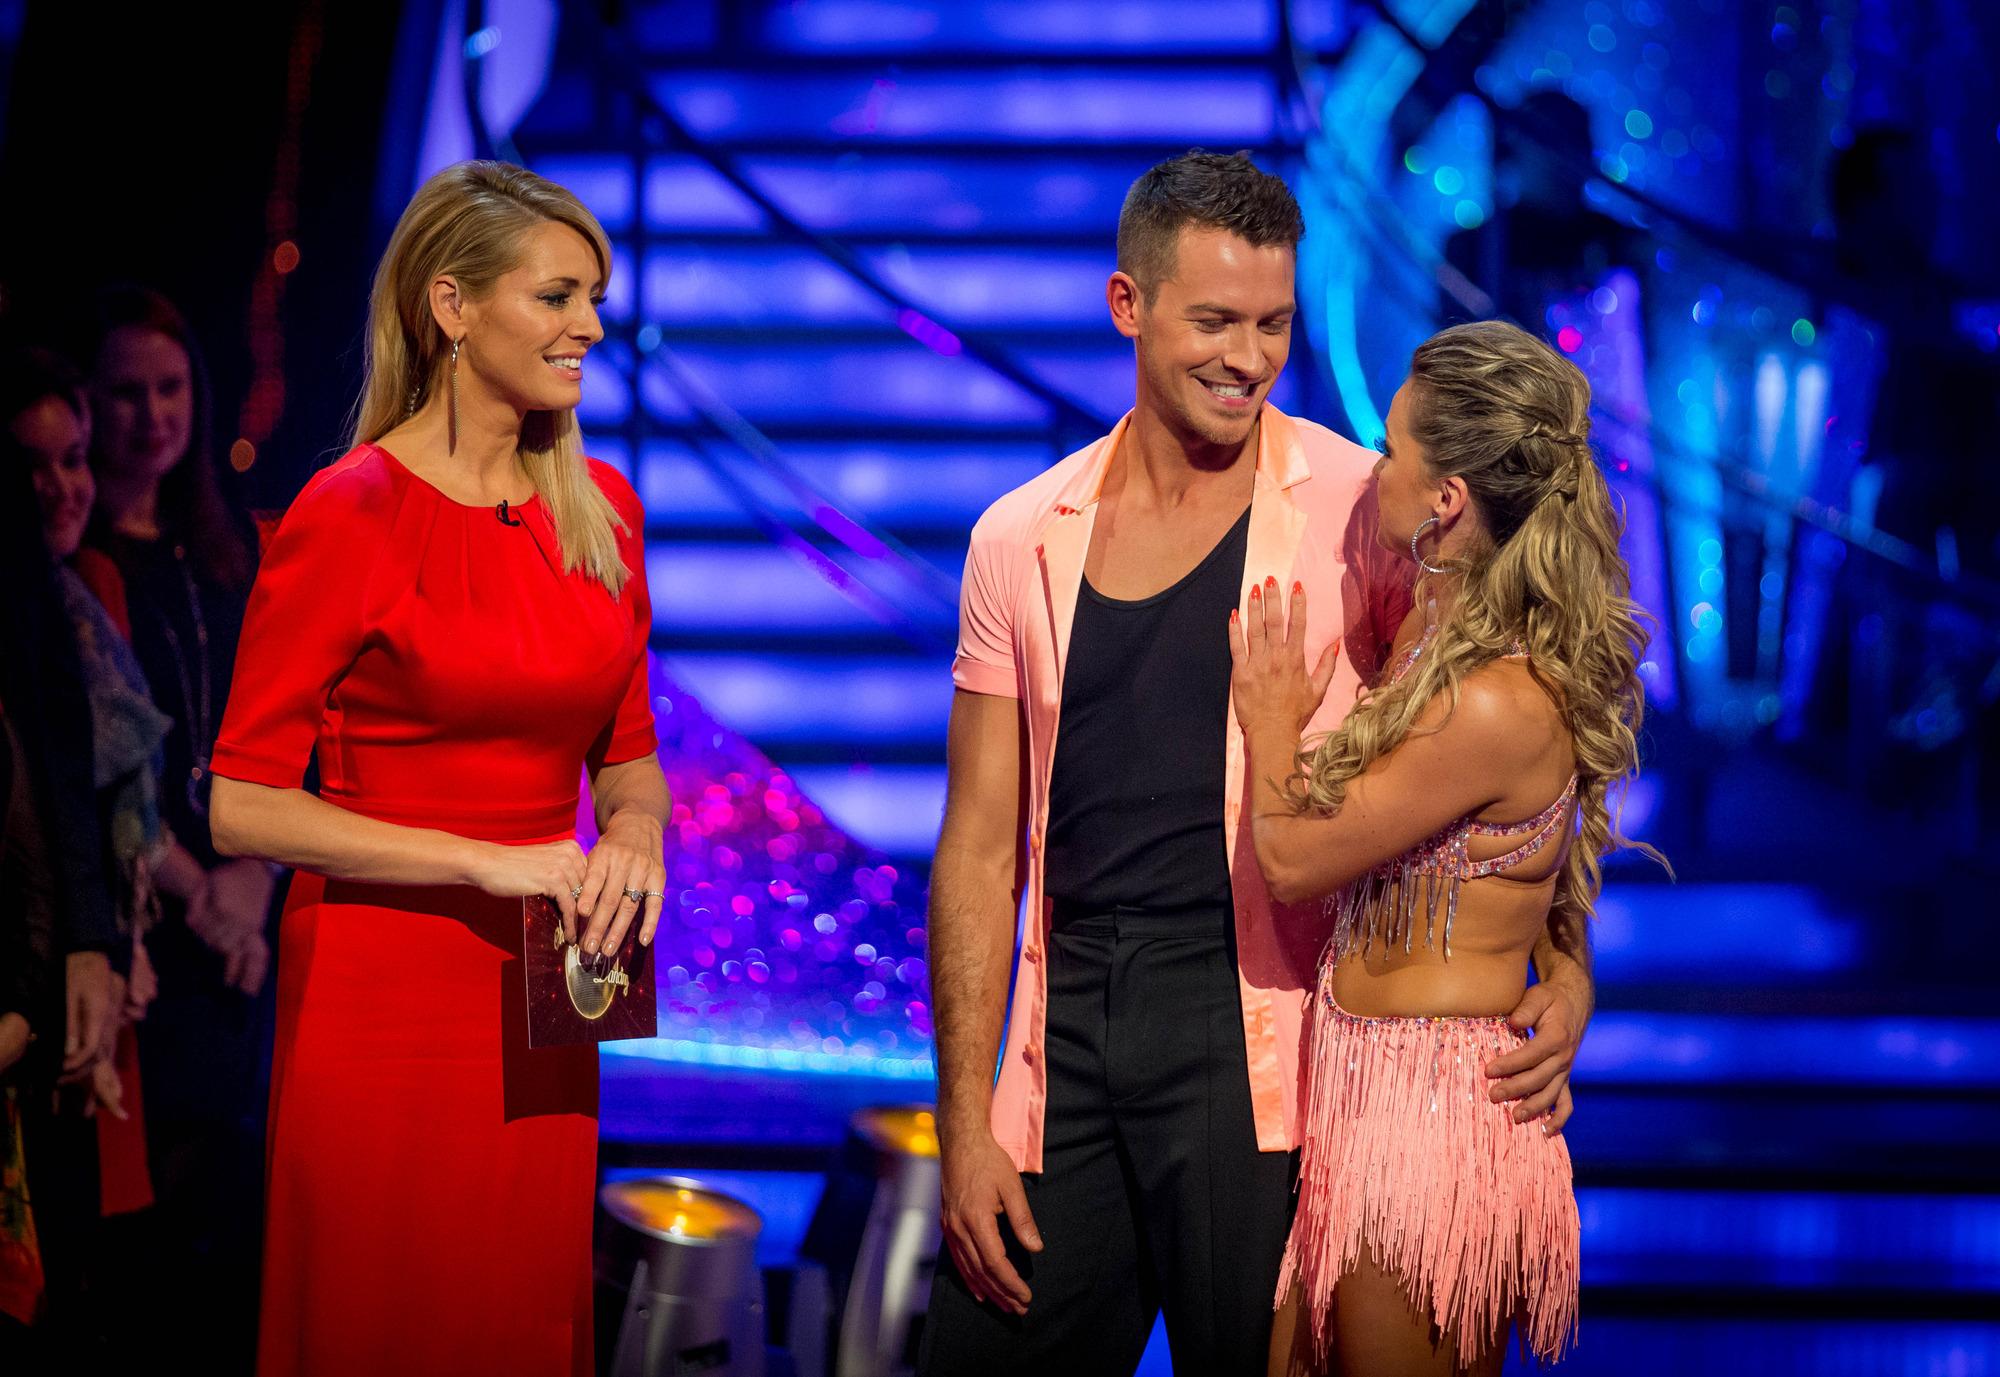 Ashley and Ola leave the competition Tess Daly, Ashley Taylor Dawson, Ola Jordan - (C) BBC - Photographer: Guy Levy